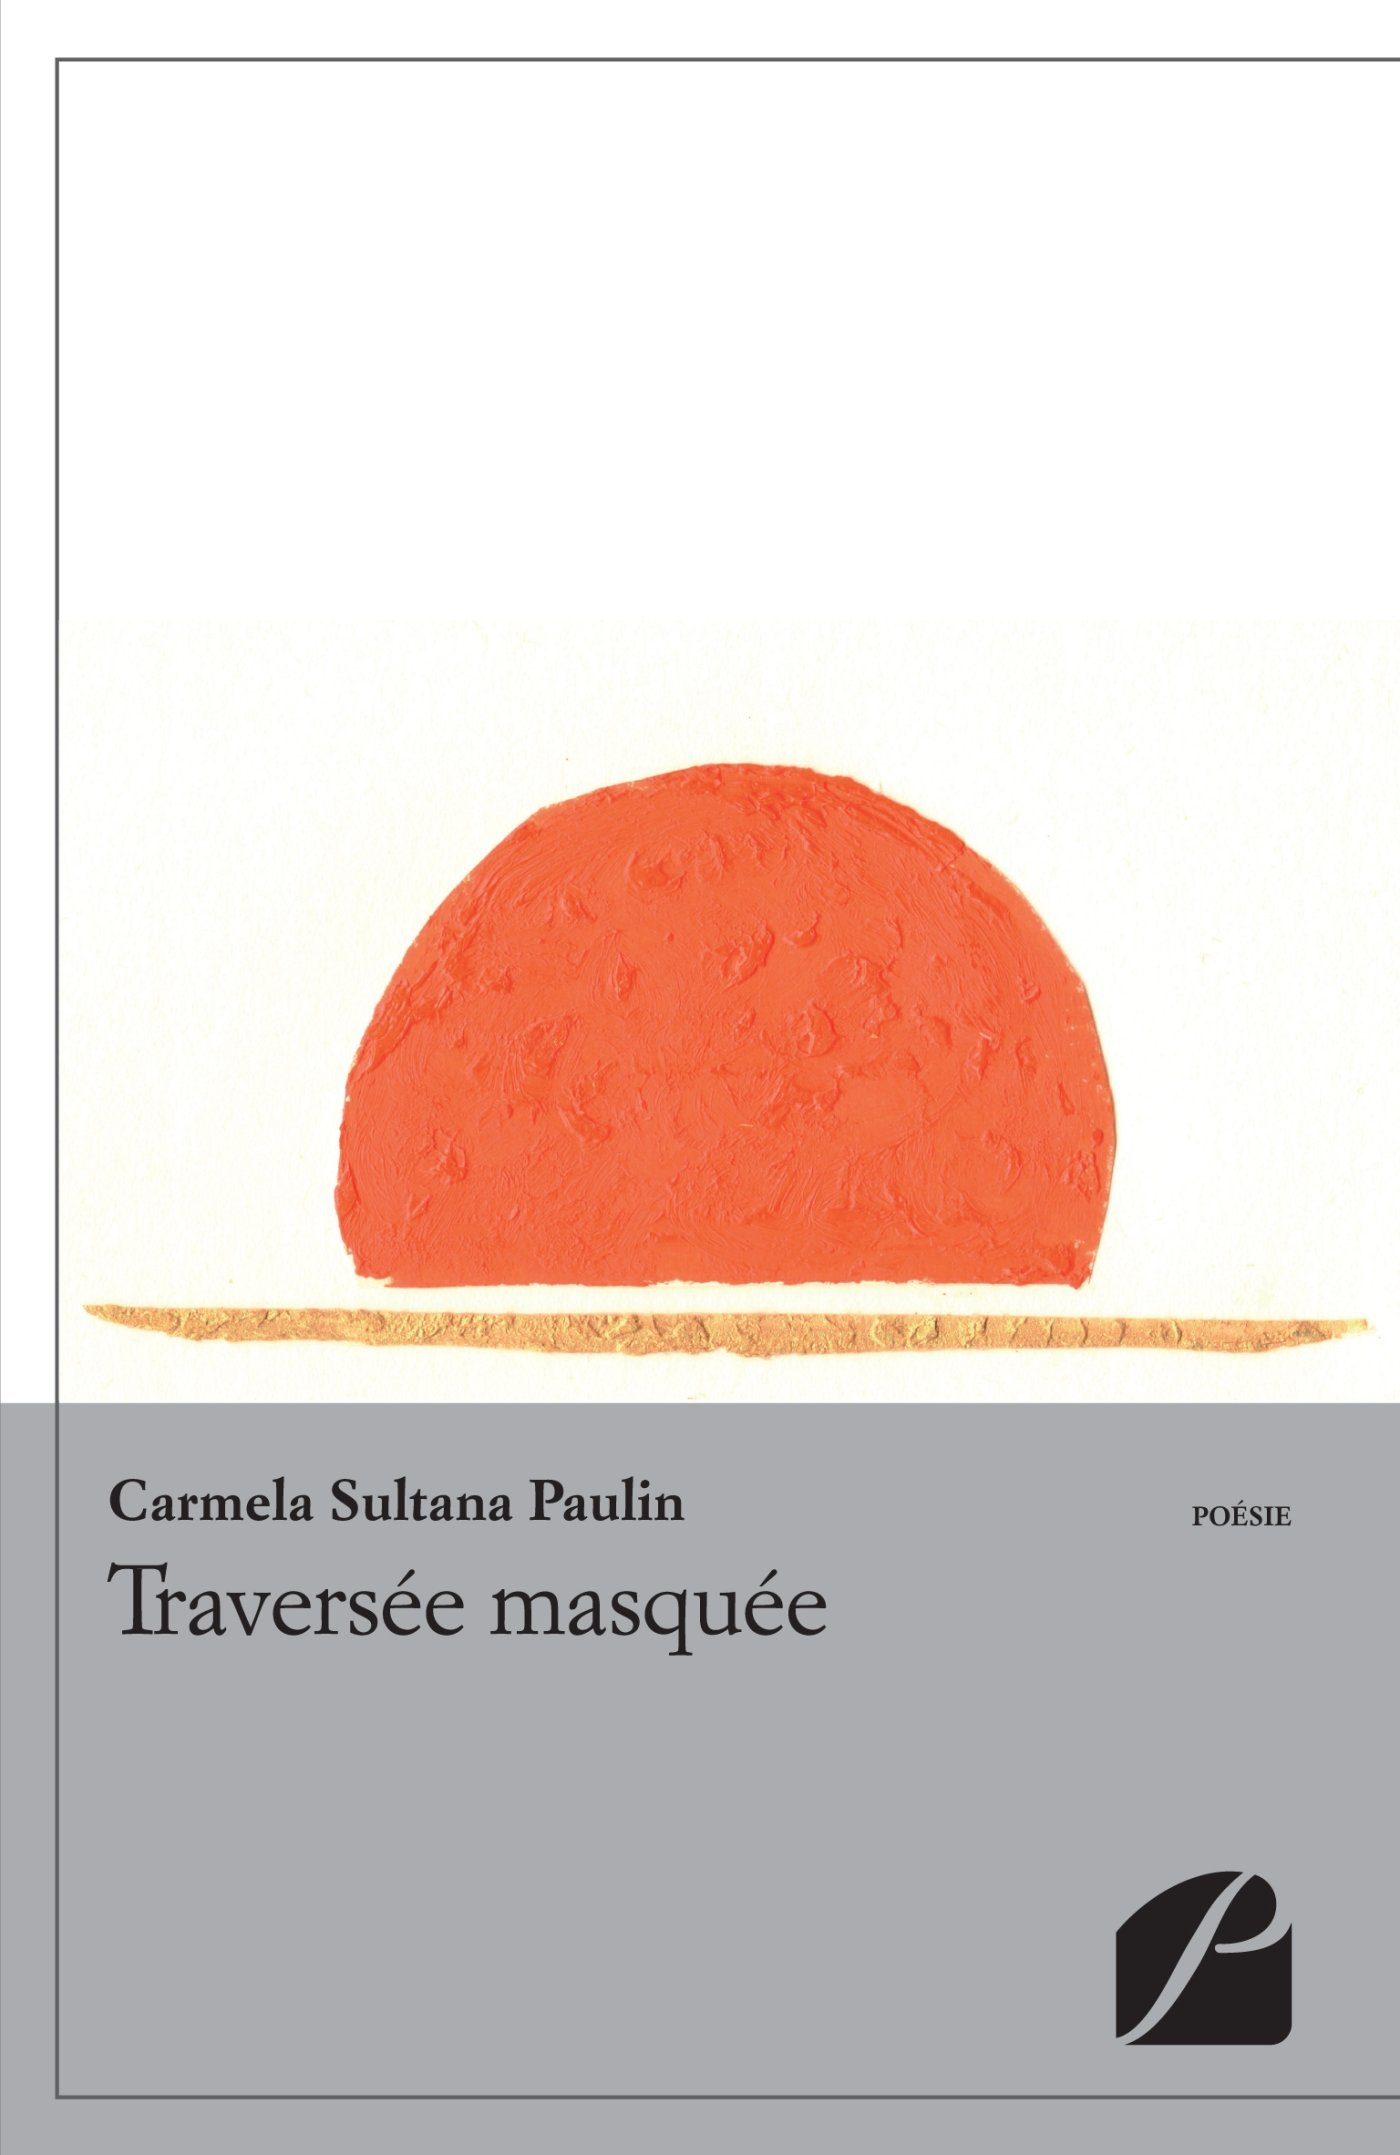 Download Traversée masquée (French Edition) ebook